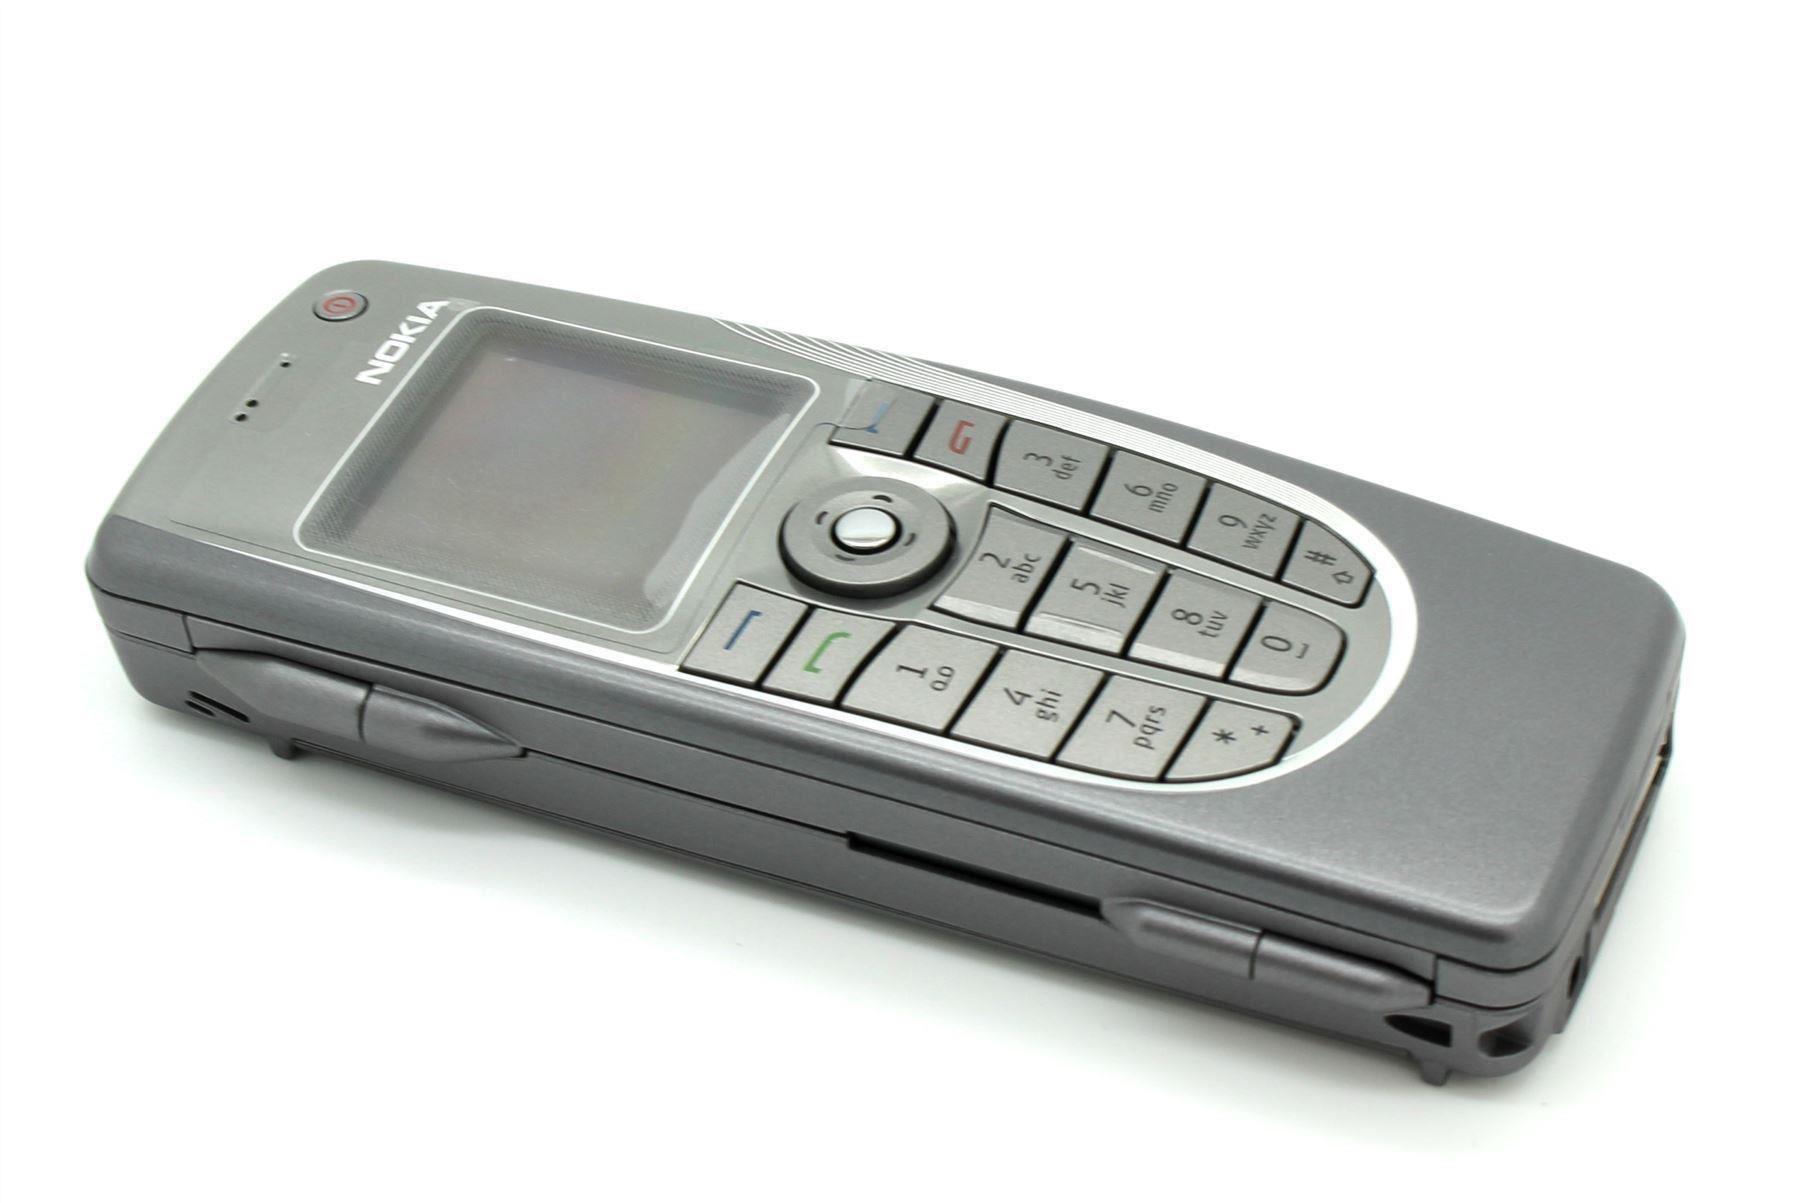 nokia 9300i sliver unlocked mobile phone new condition ebay rh ebay ie nokia 9300i manual nokia 9300i service manual